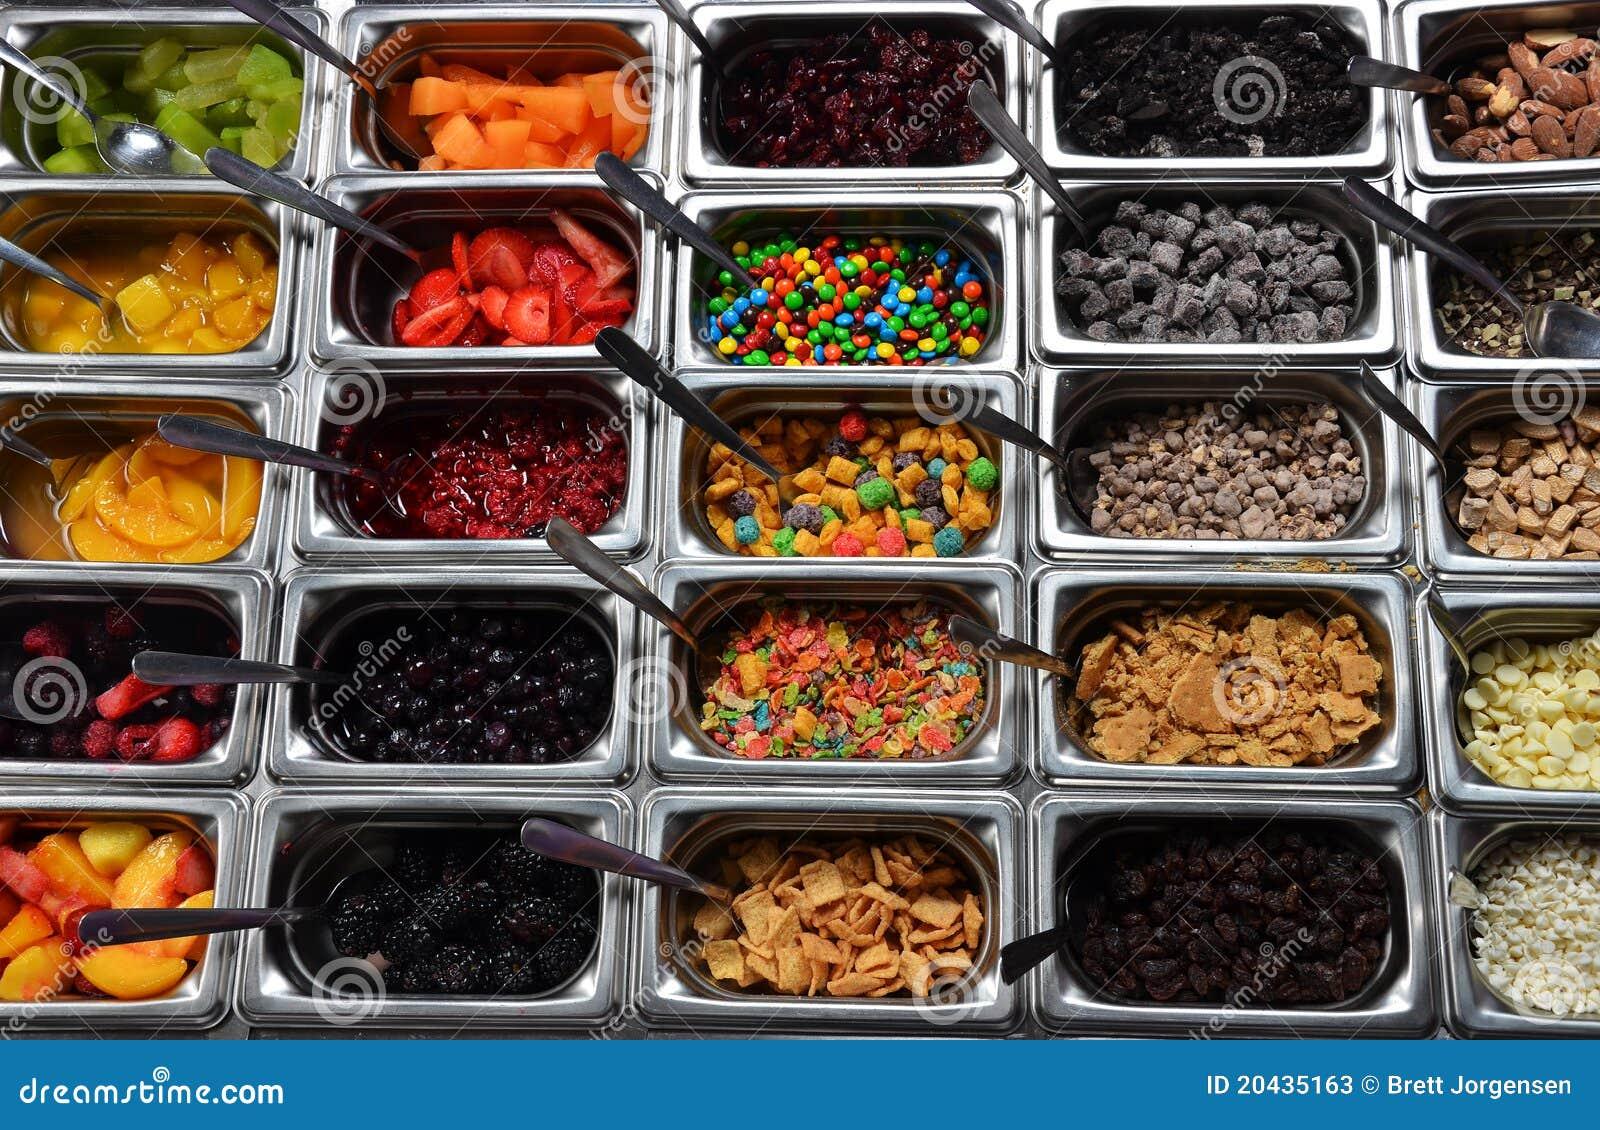 Business plan for a yogurt shop